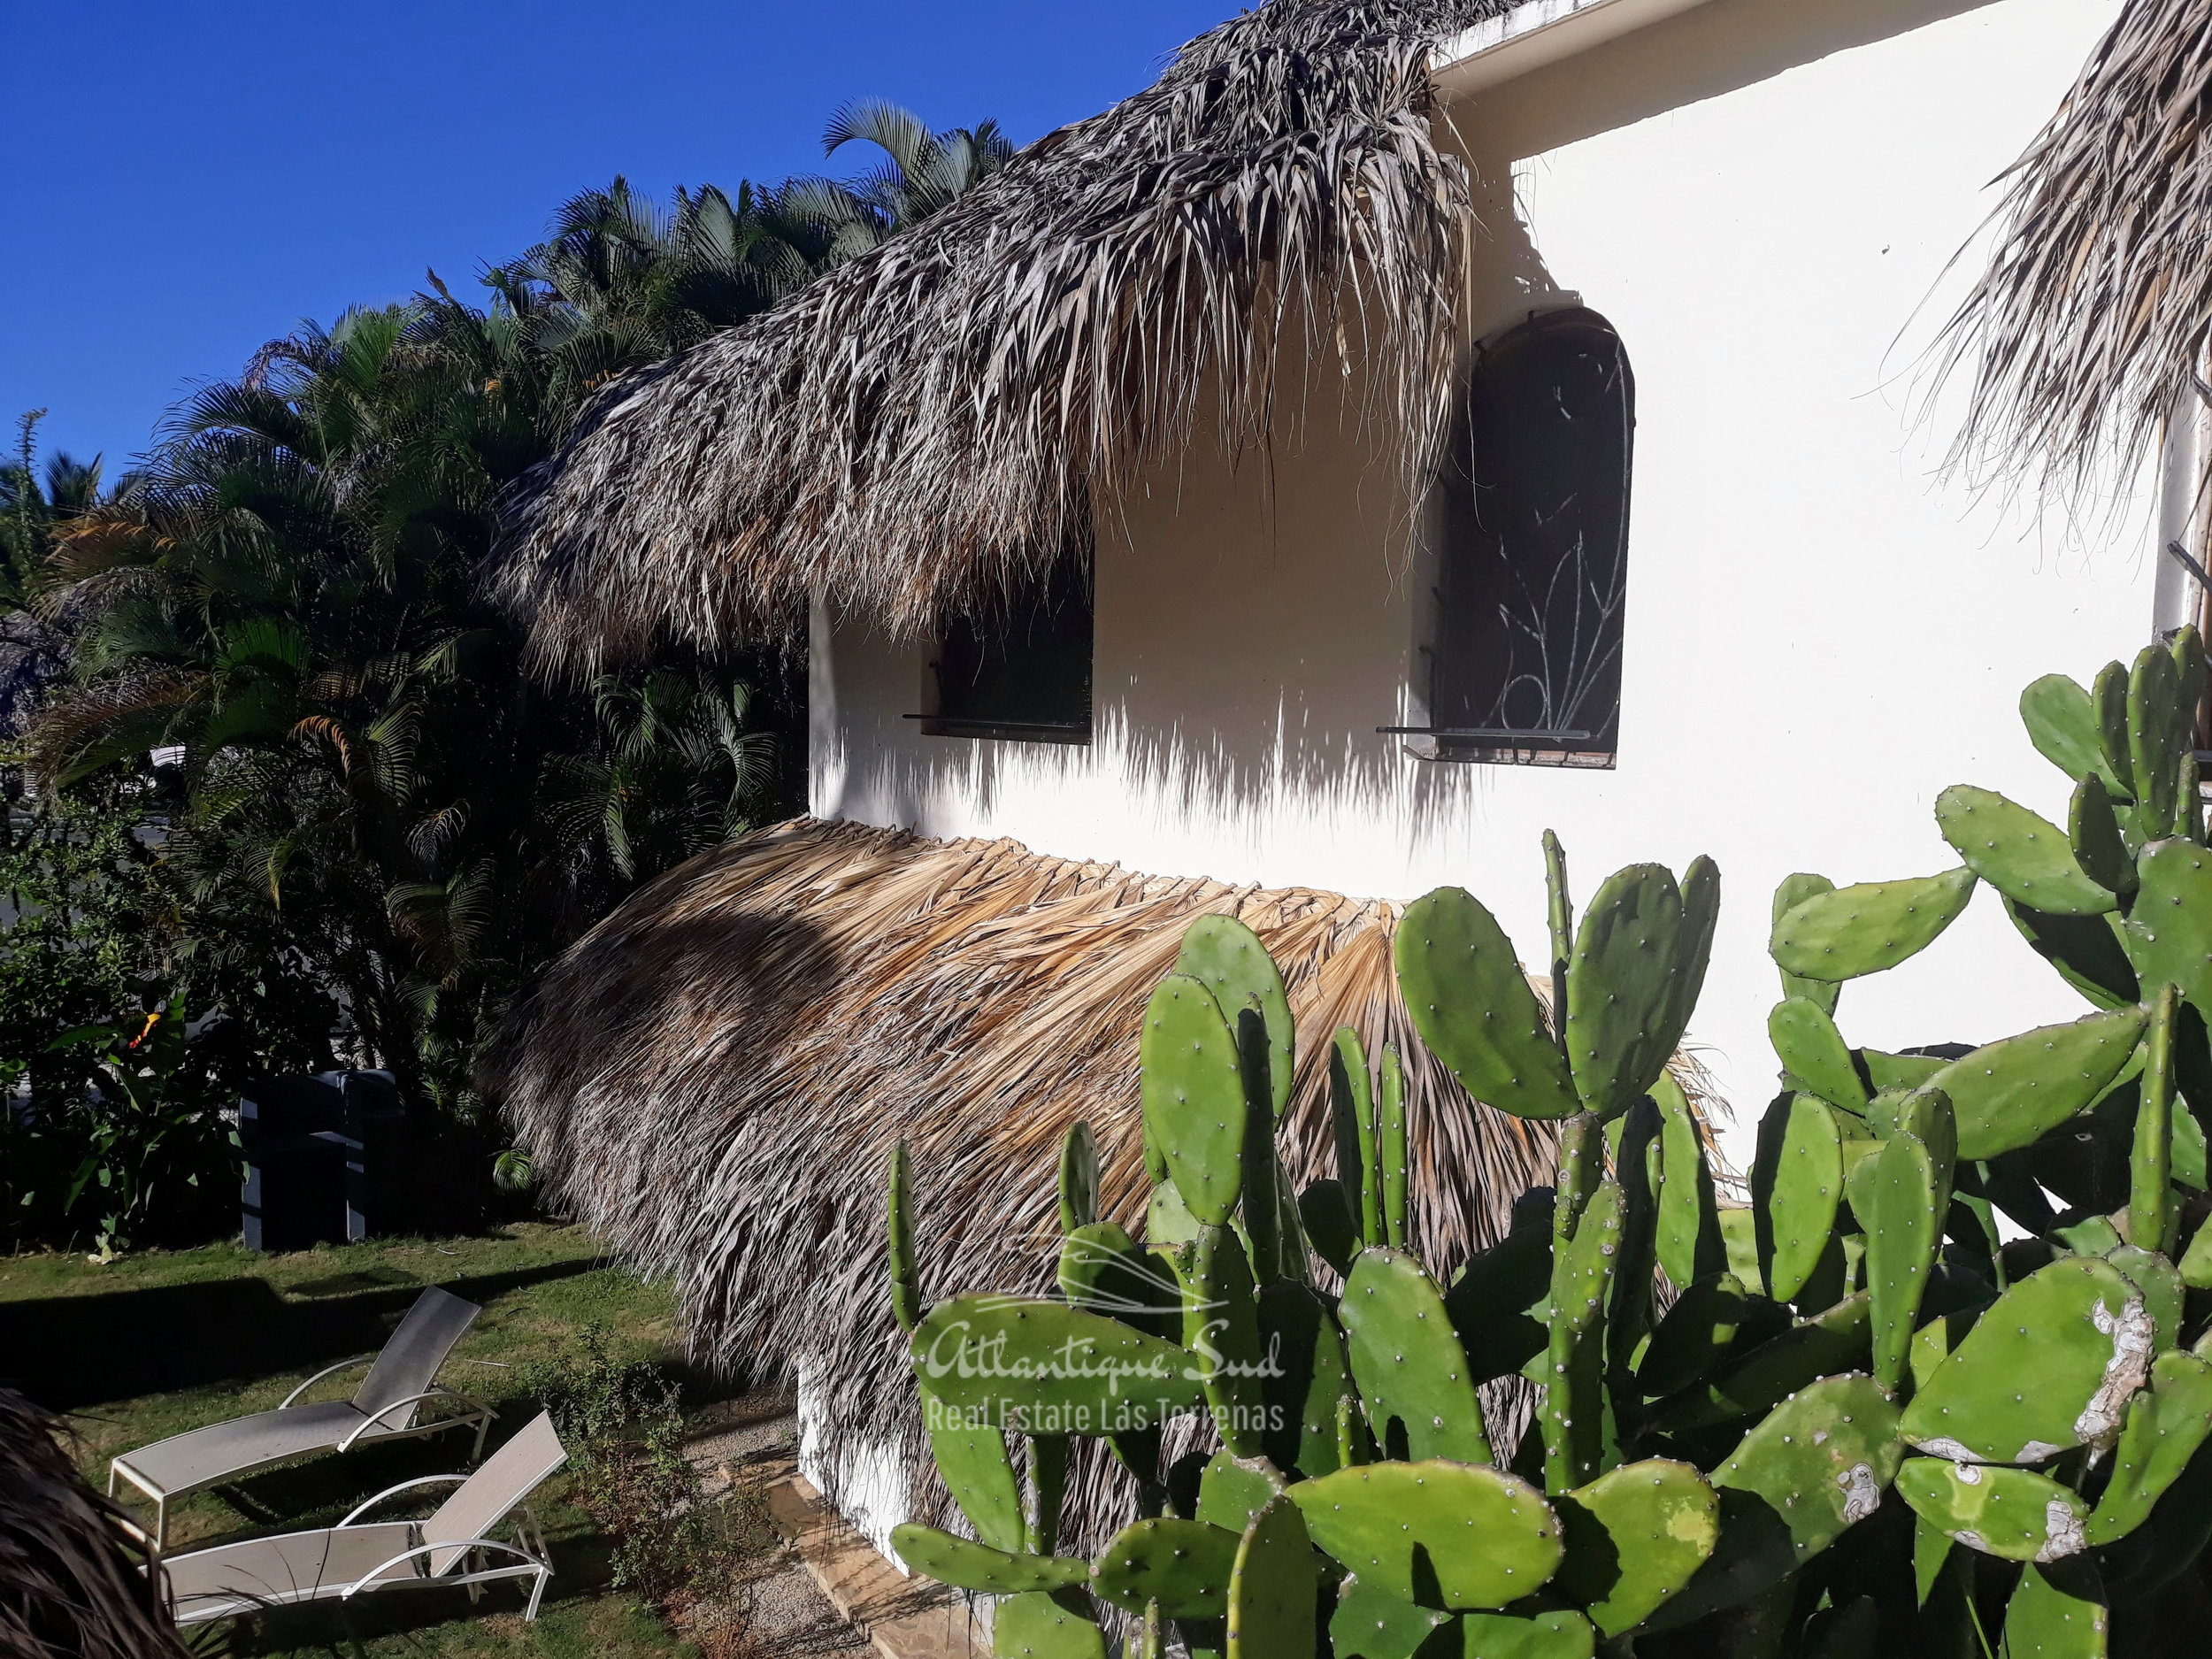 Authentic Caribbean Villa in quiet community in Real Estate Las Terrenas Atlantique Sud33.jpg